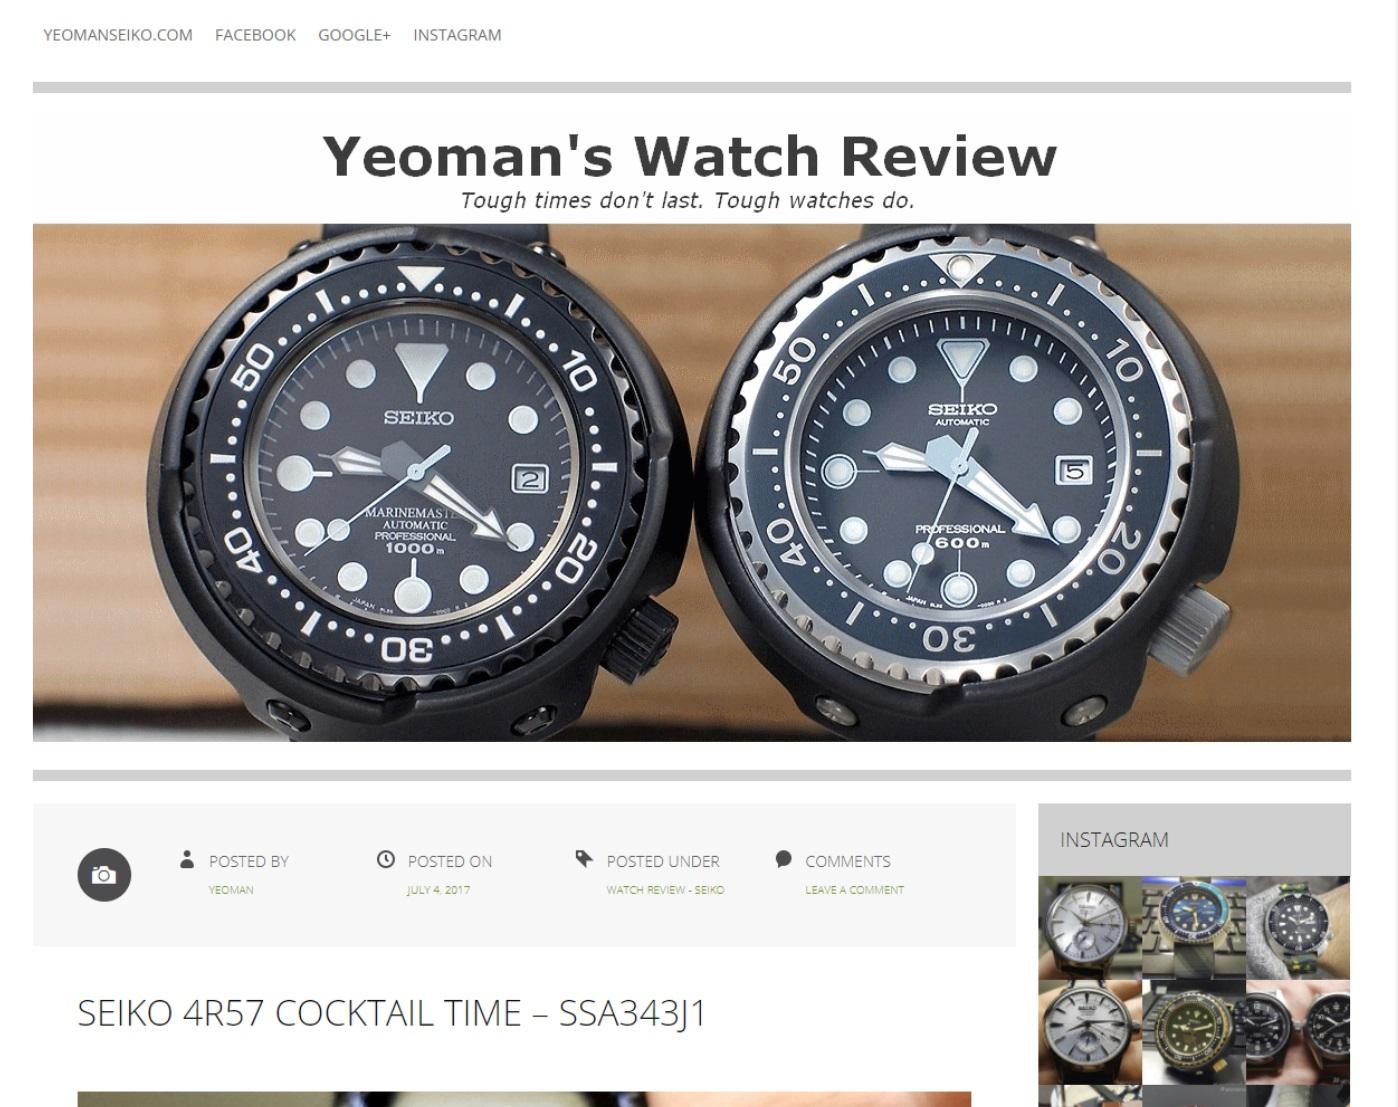 Blog de revue de montre de yeoman